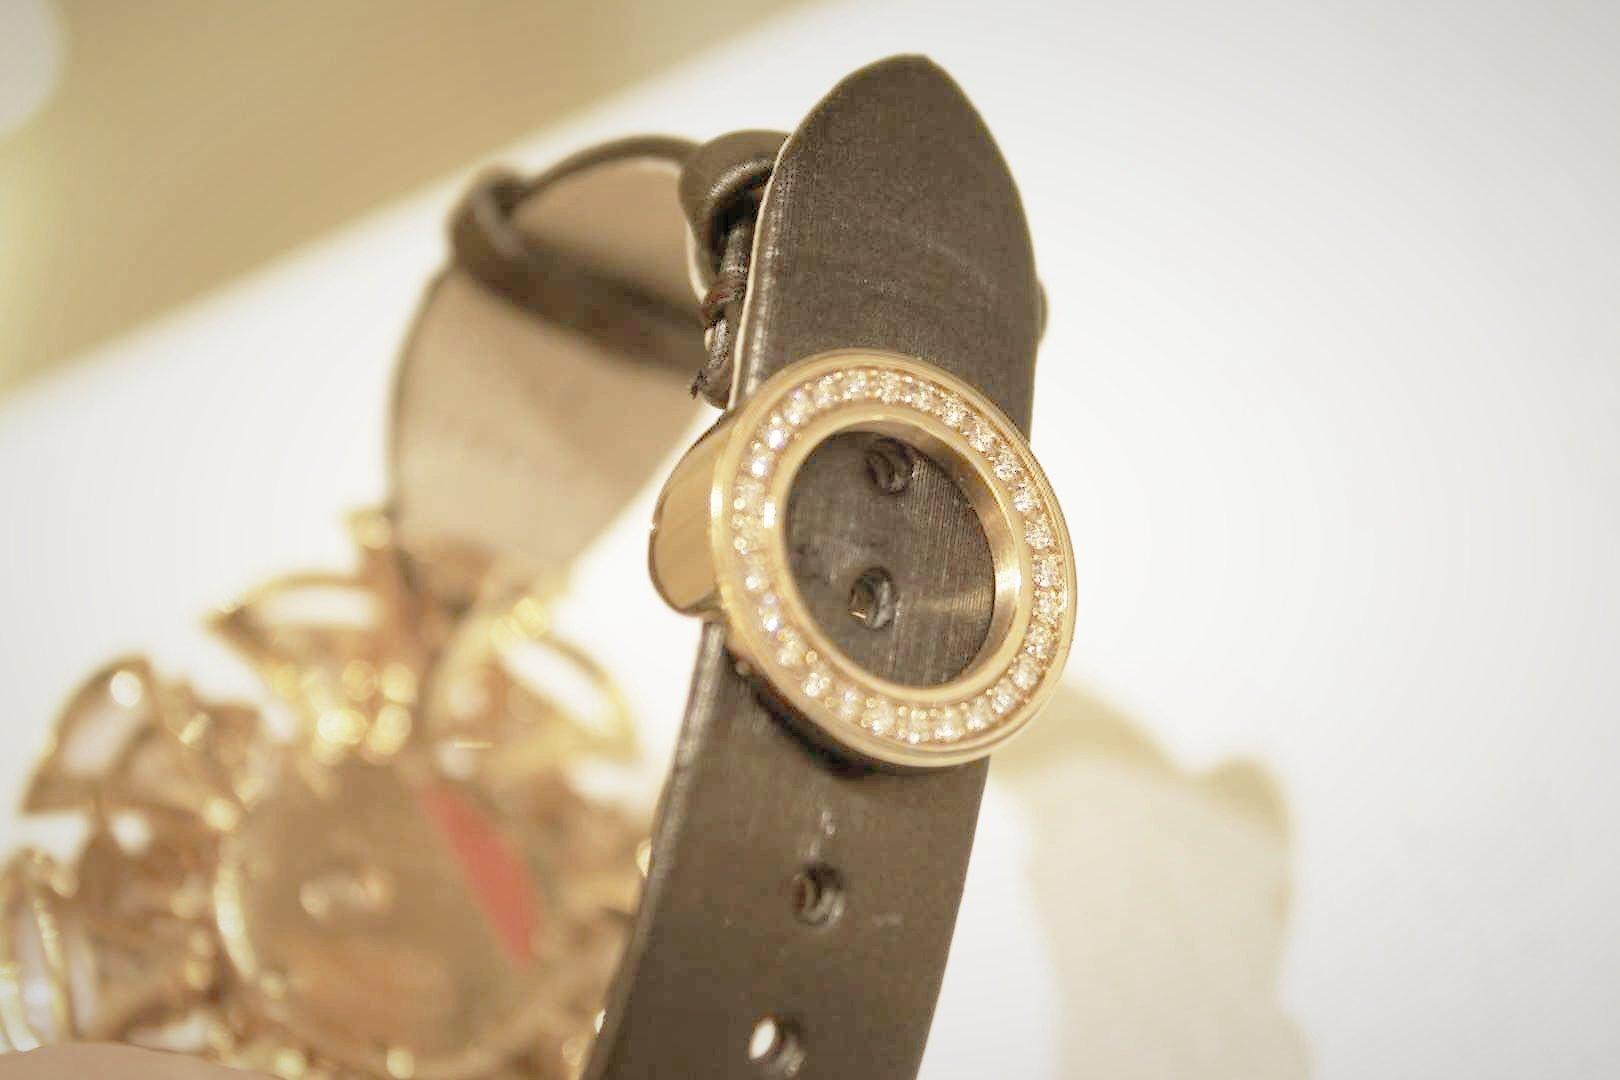 BVLGARI宝格丽女表DIVAS'DREAM 珠宝腕表系列 39mm 102420插图2